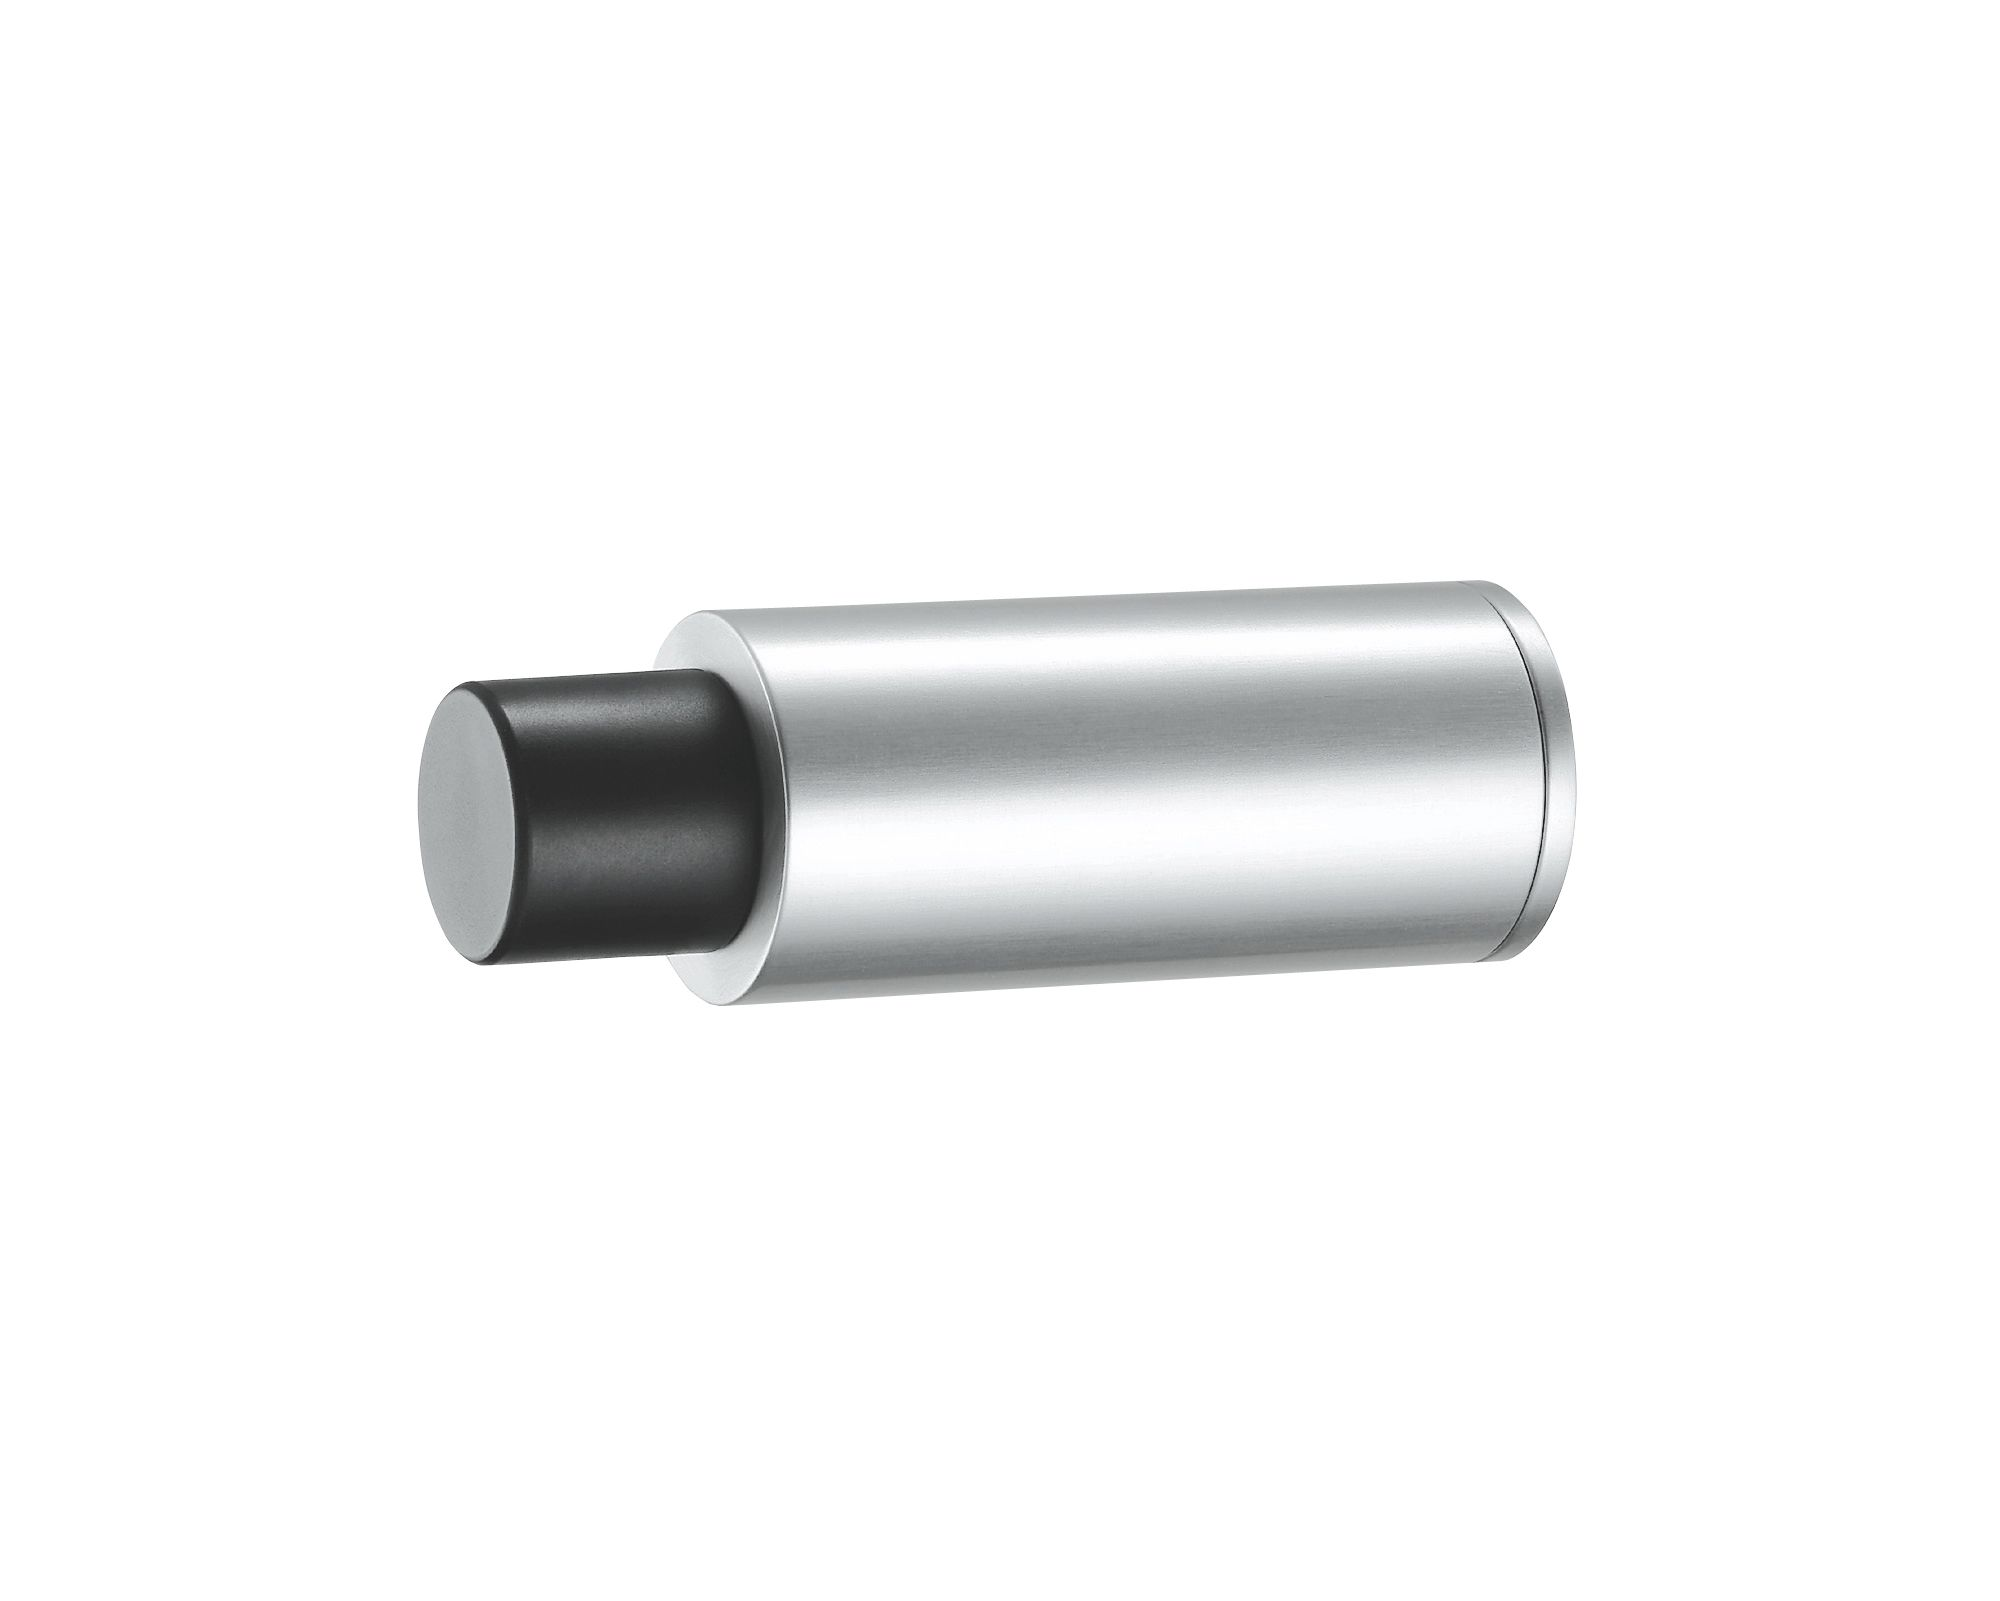 23d Door Stopper Architectural Hardware Products West Inx Ltd